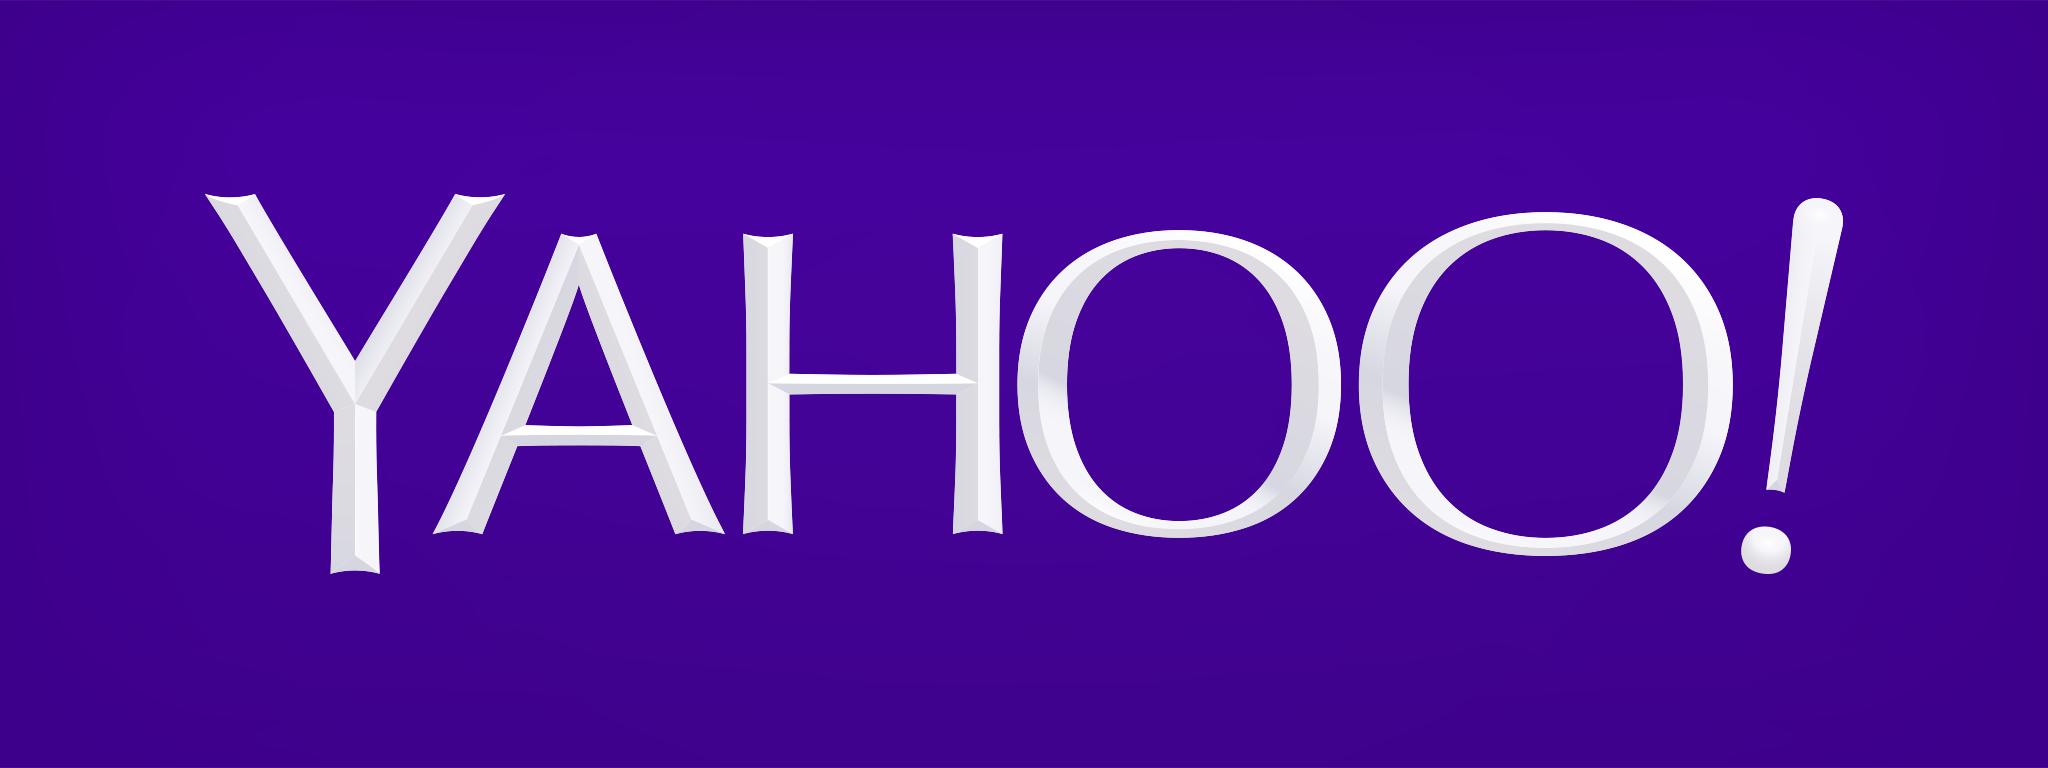 Geocities has shut down - Yahoo Small Business